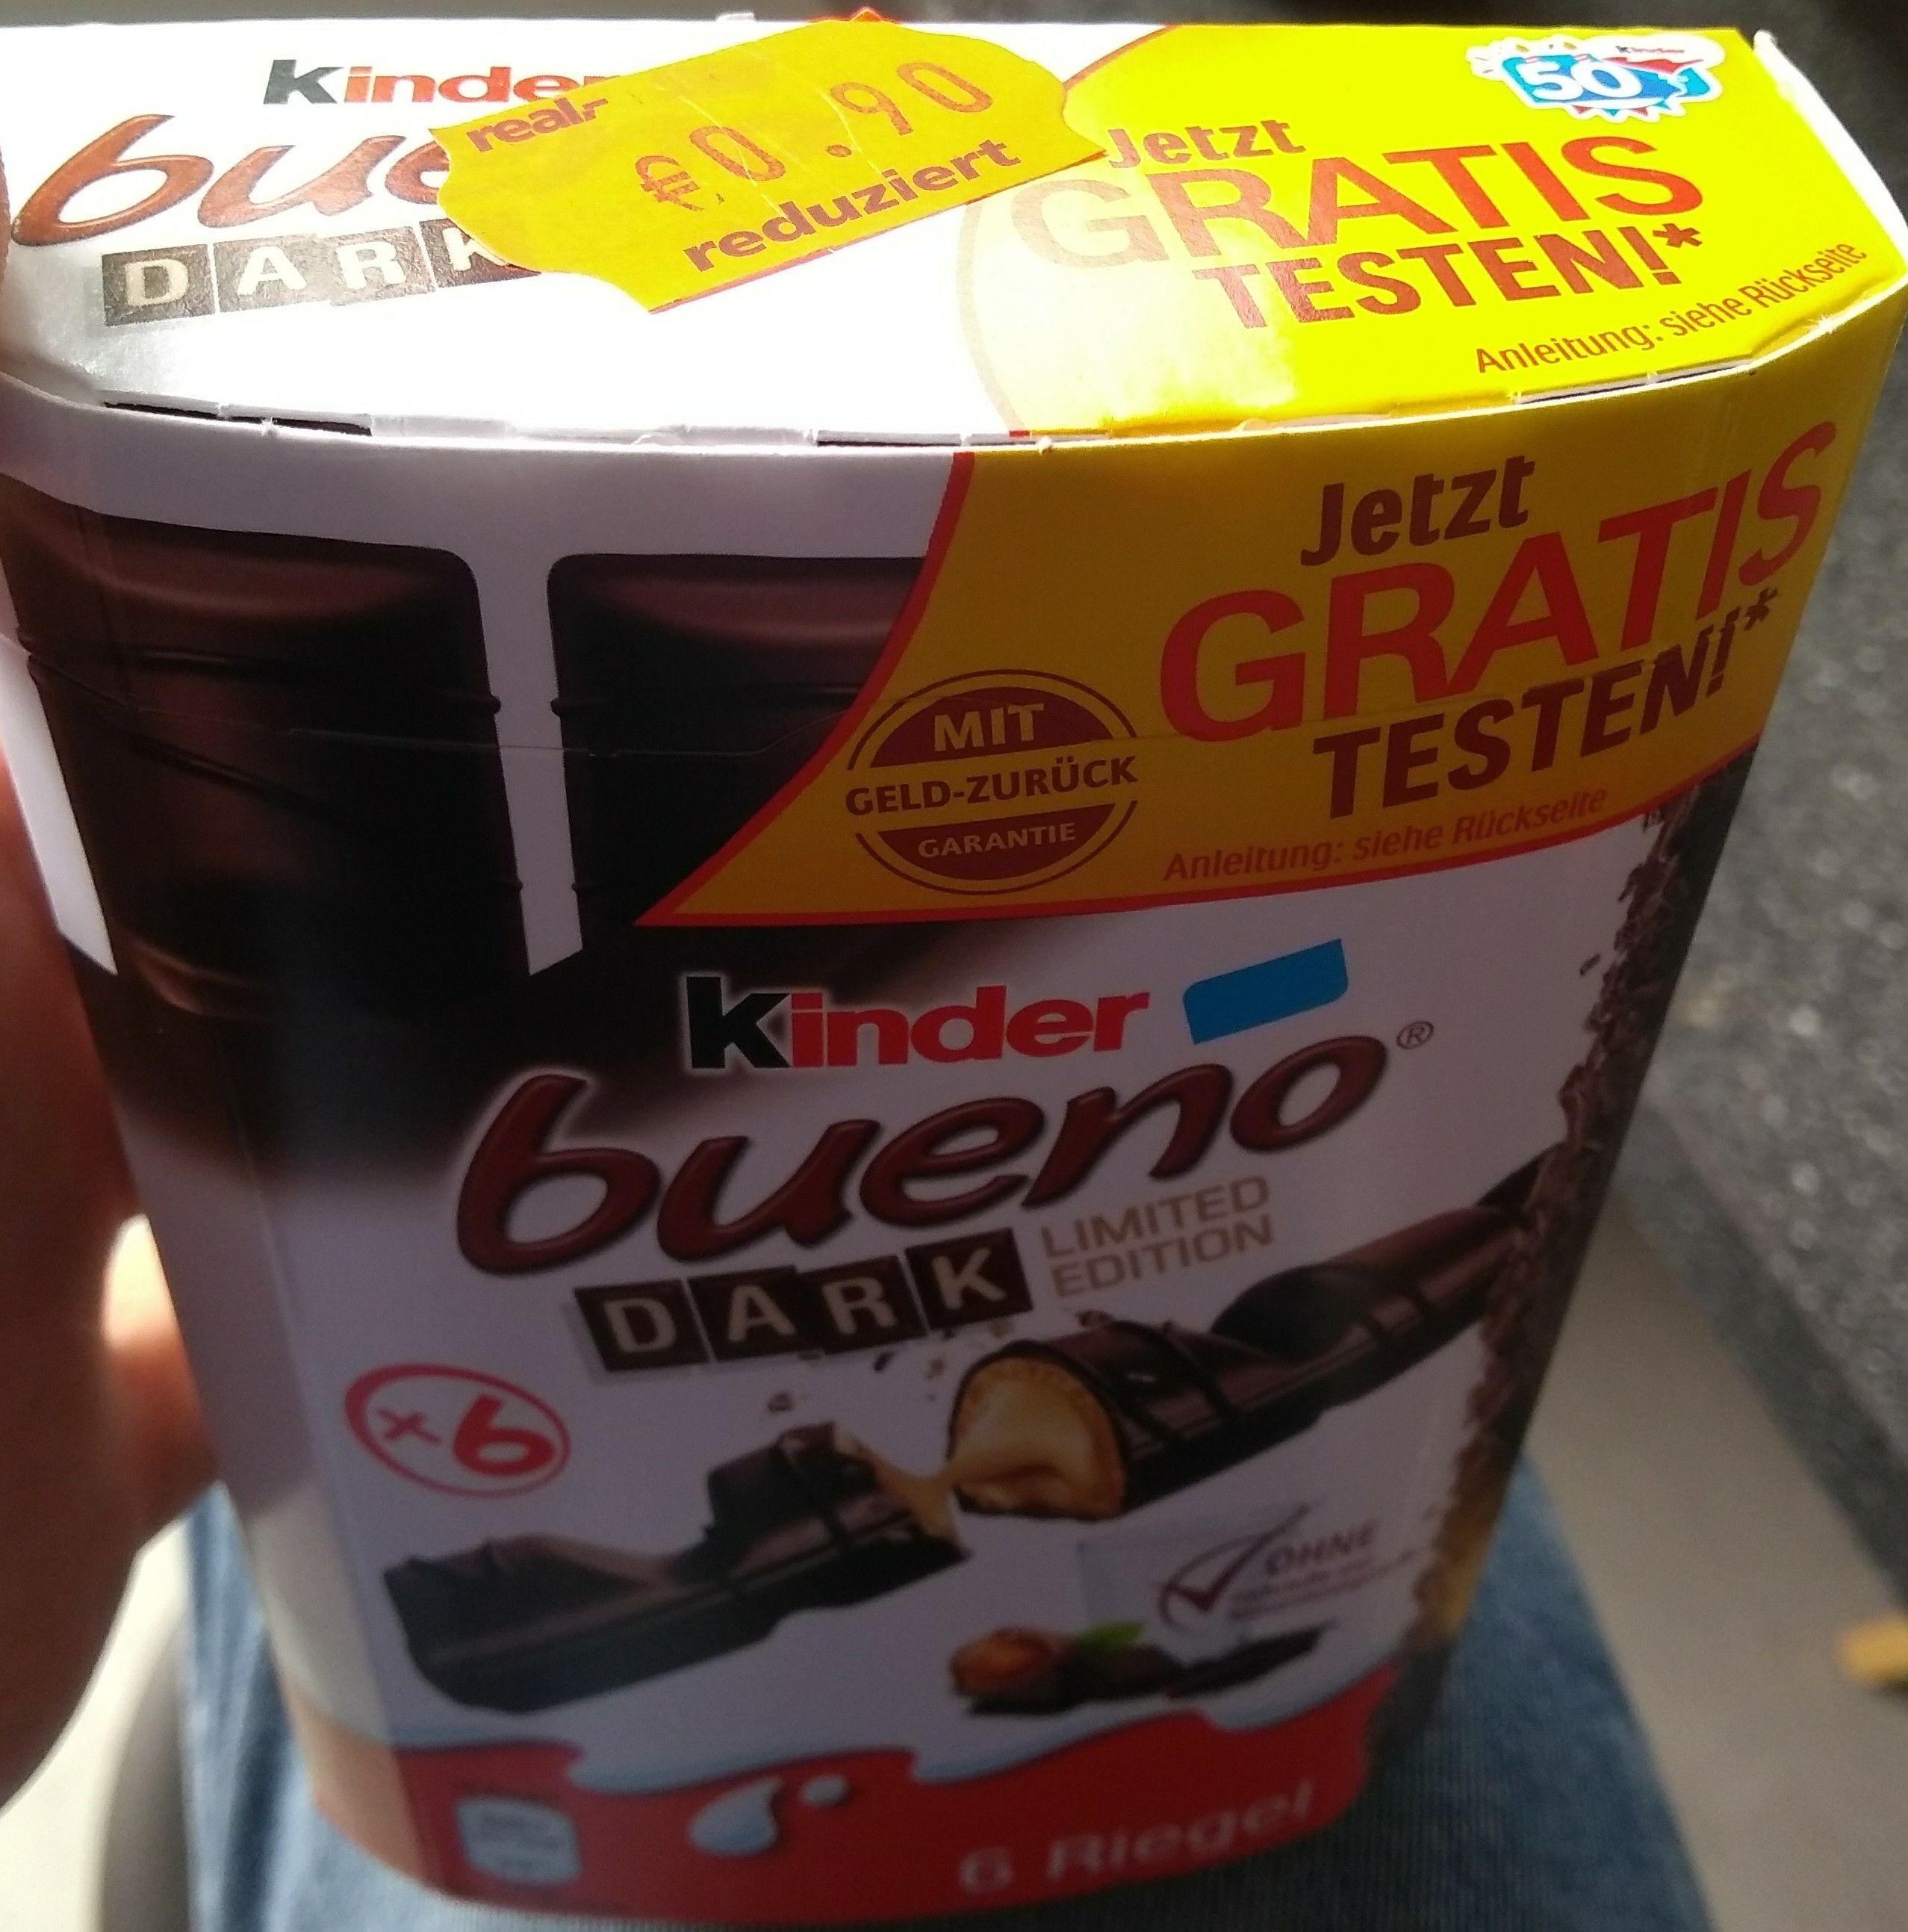 [Lokal] [Real,- Gütersloh] Kinder Bueno Dark für 0,90€